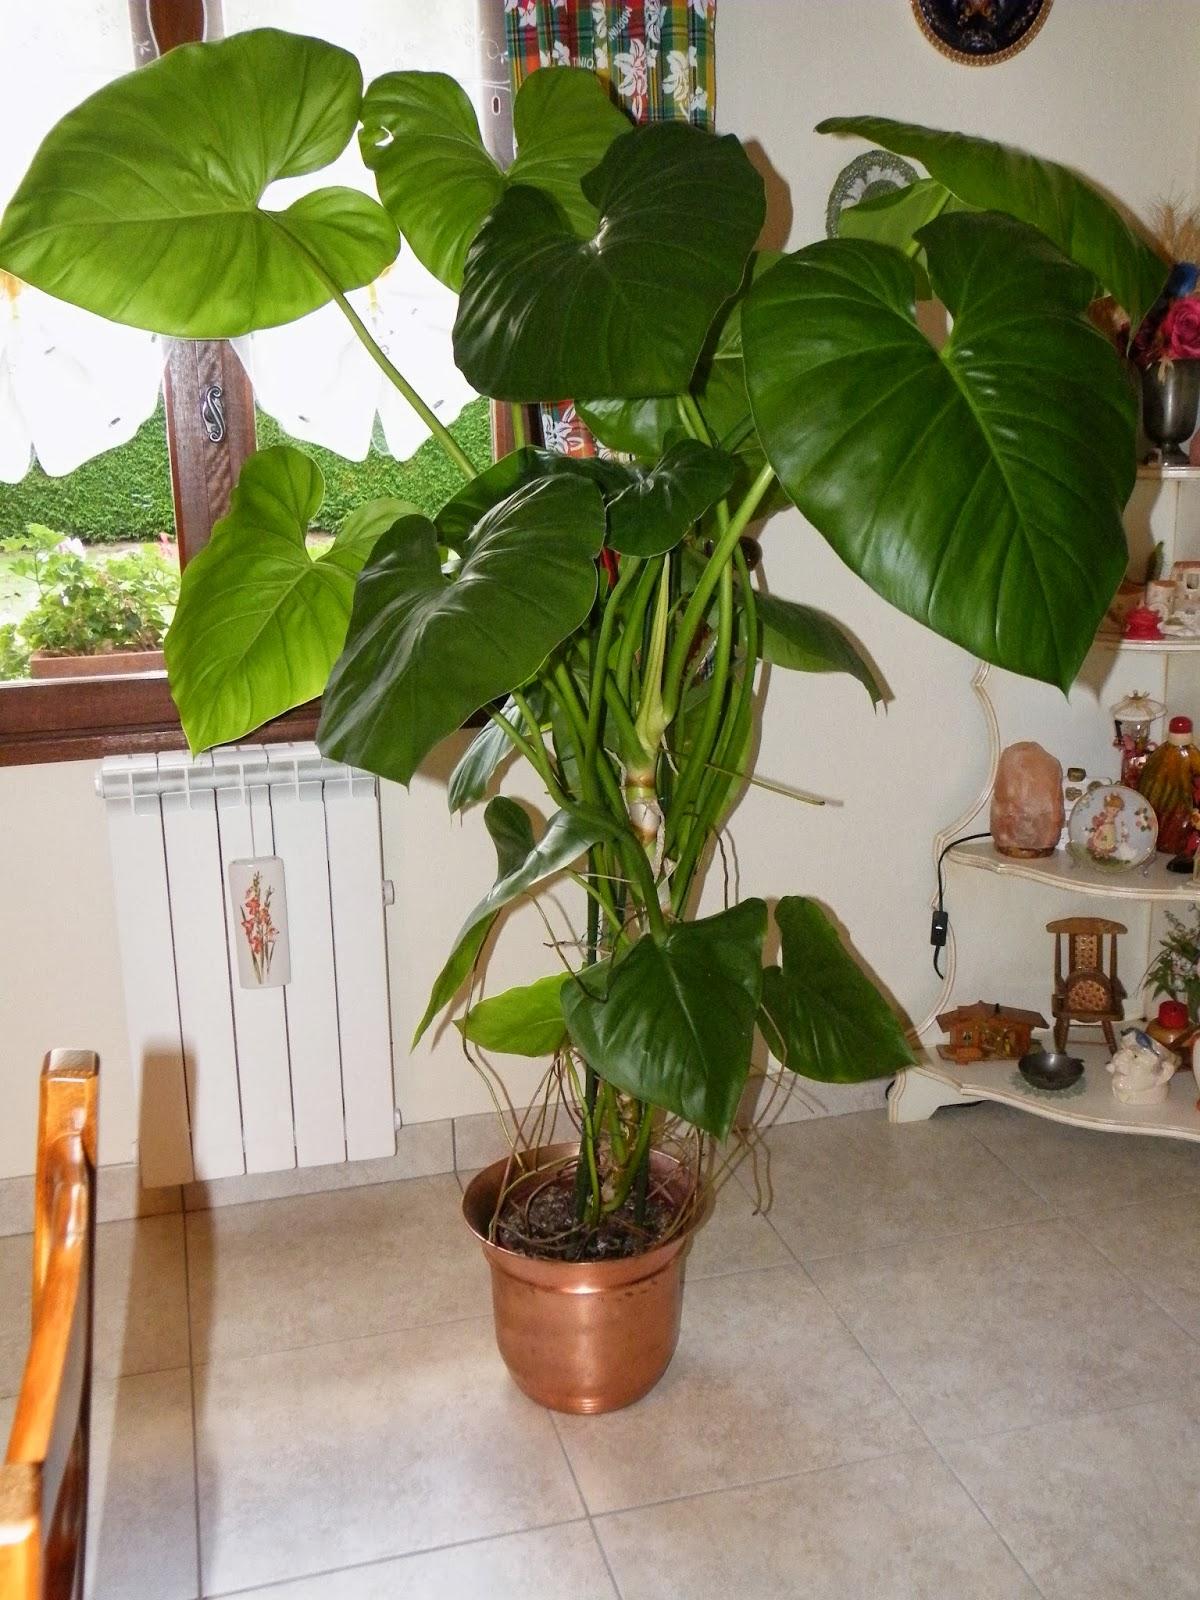 du four au jardin et mes dix doigts plante verte. Black Bedroom Furniture Sets. Home Design Ideas